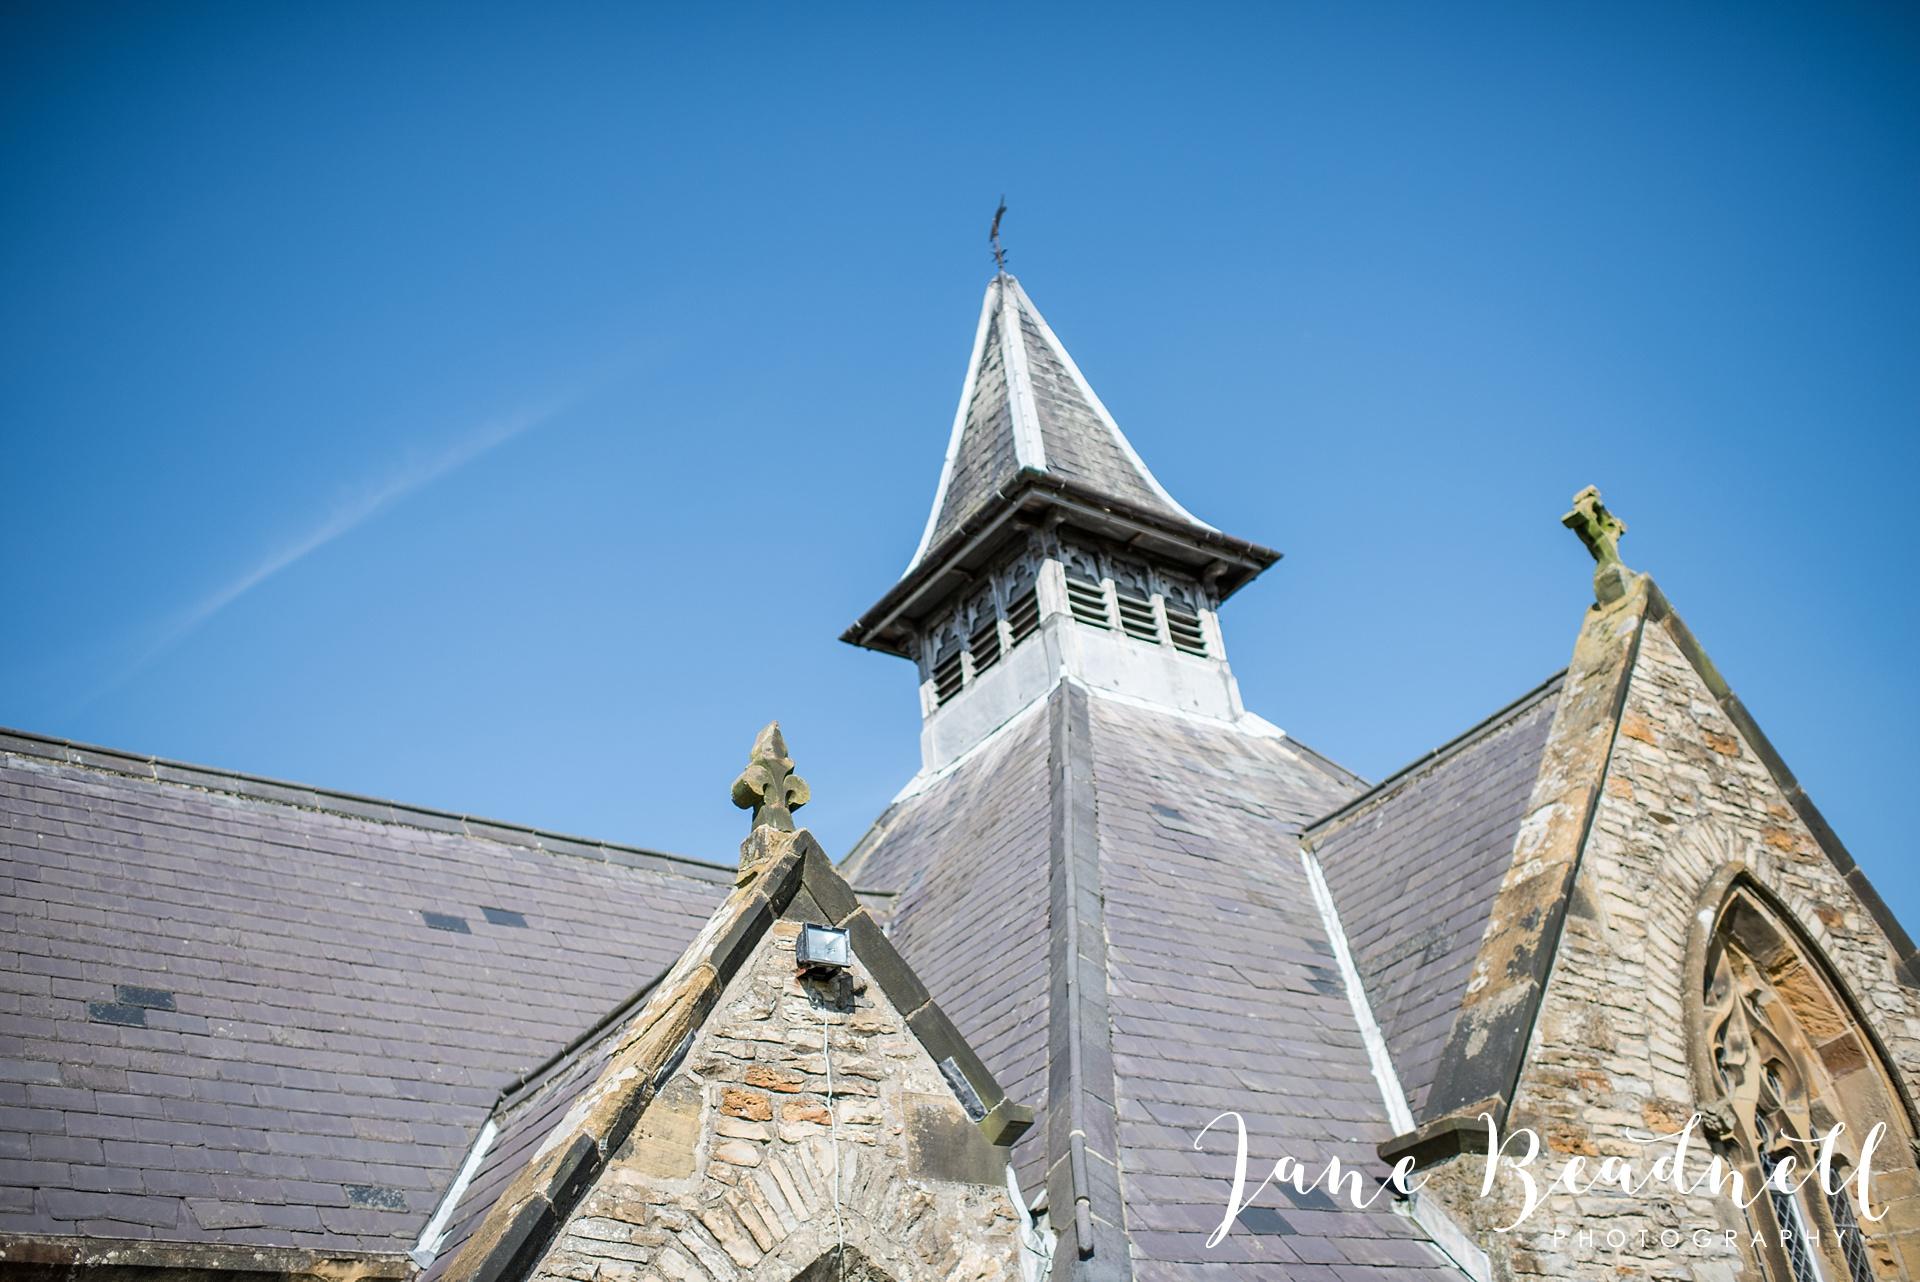 fine-art-wedding-photographer-jane-beadnell-yorkshire-wedding-photographer_0034